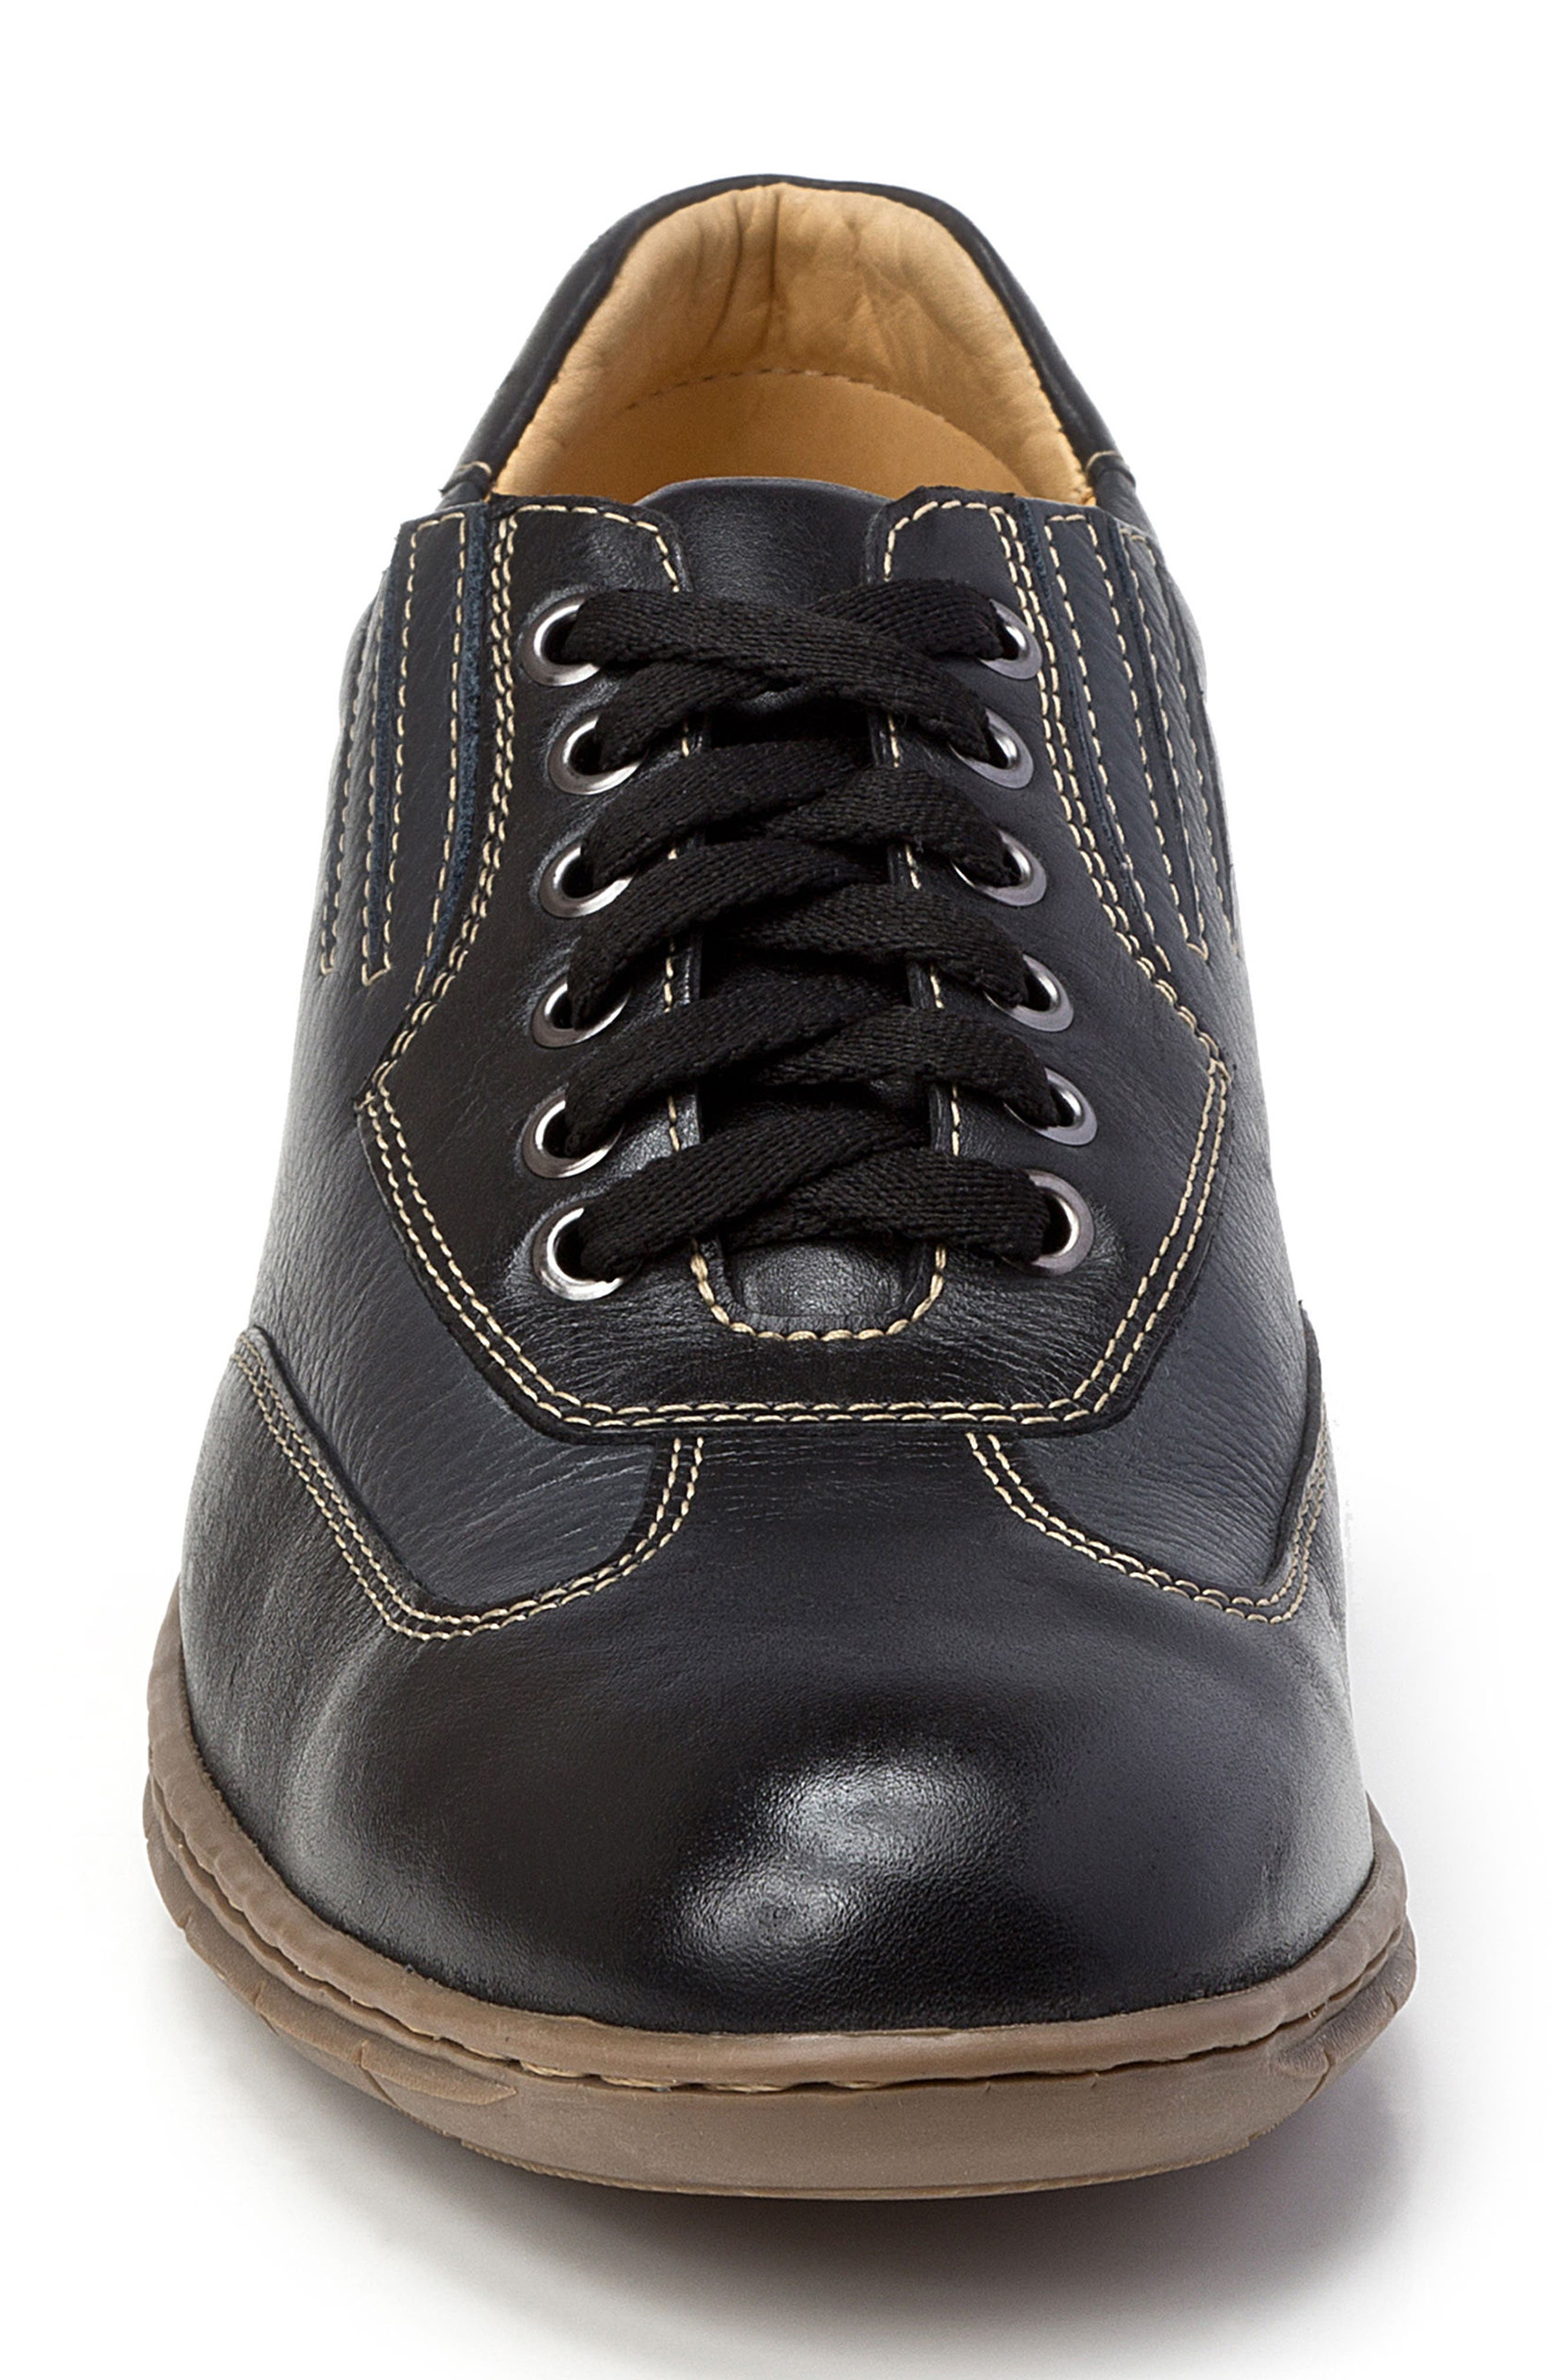 Vernon Sneaker,                             Alternate thumbnail 4, color,                             Black Leather